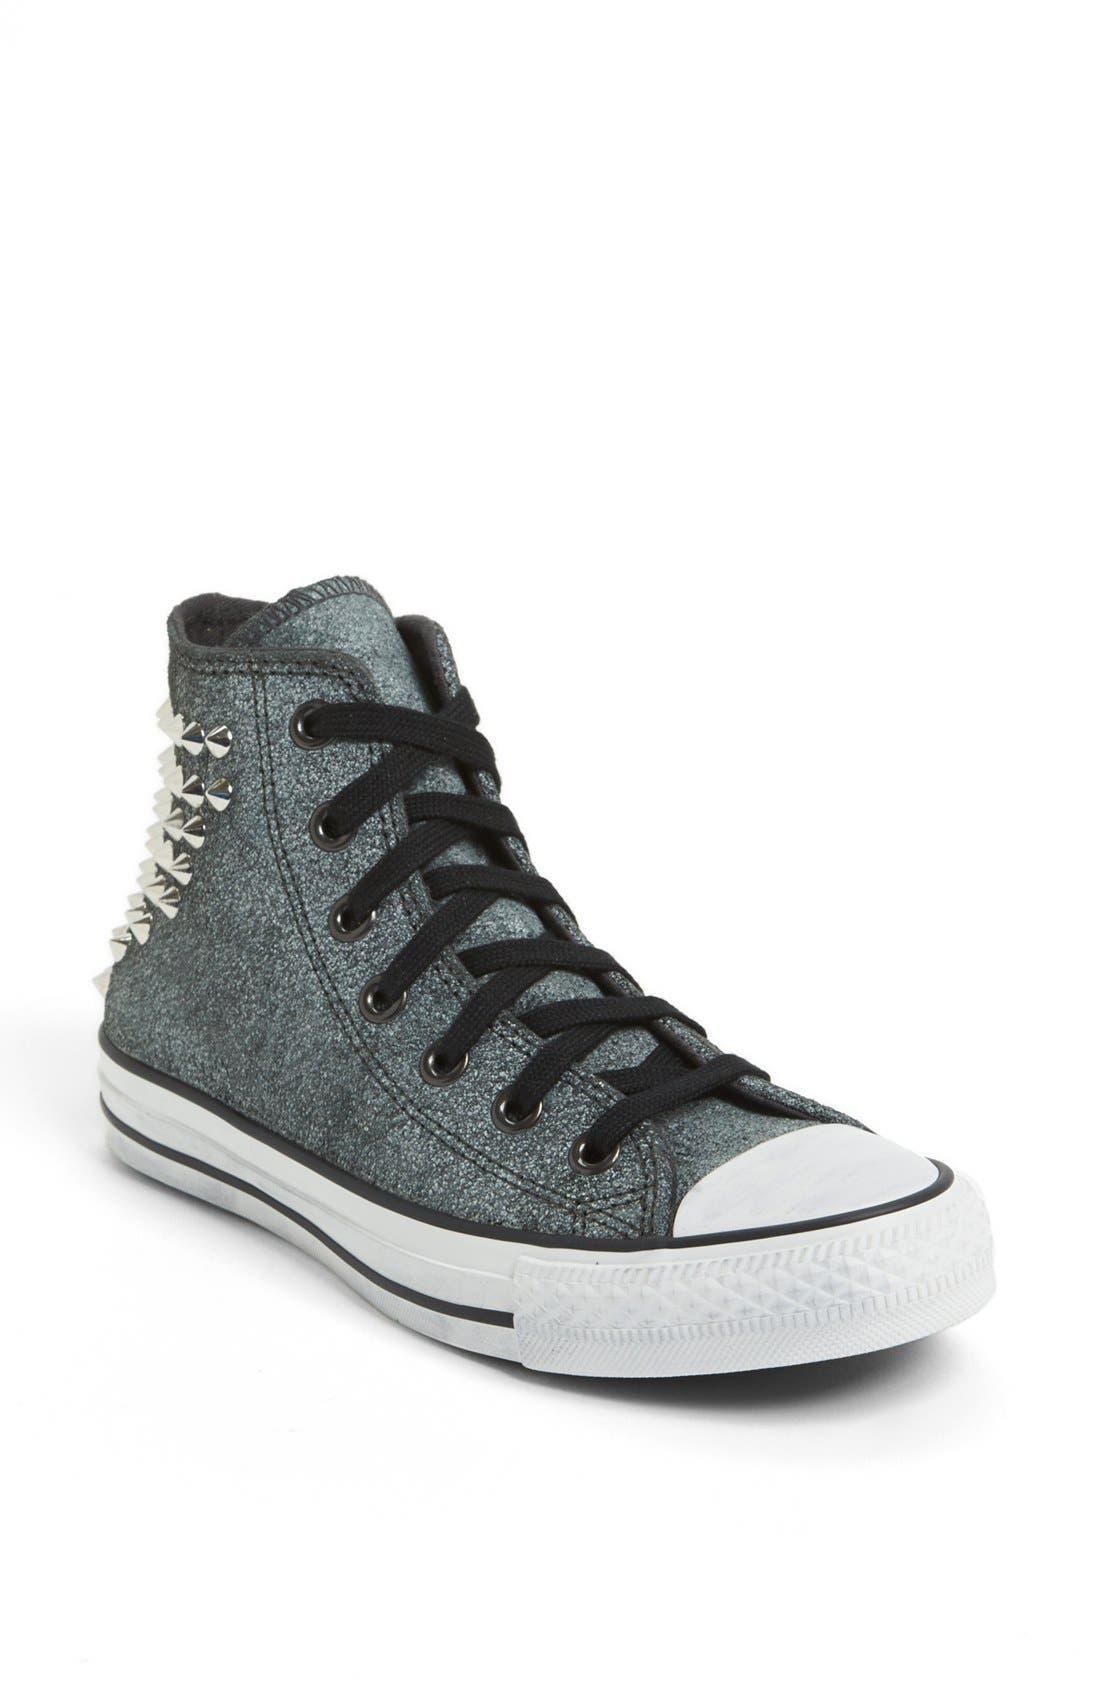 Alternate Image 1 Selected - Converse Chuck Taylor® All Star® 'Collar Studs' High Top Sneaker (Women)